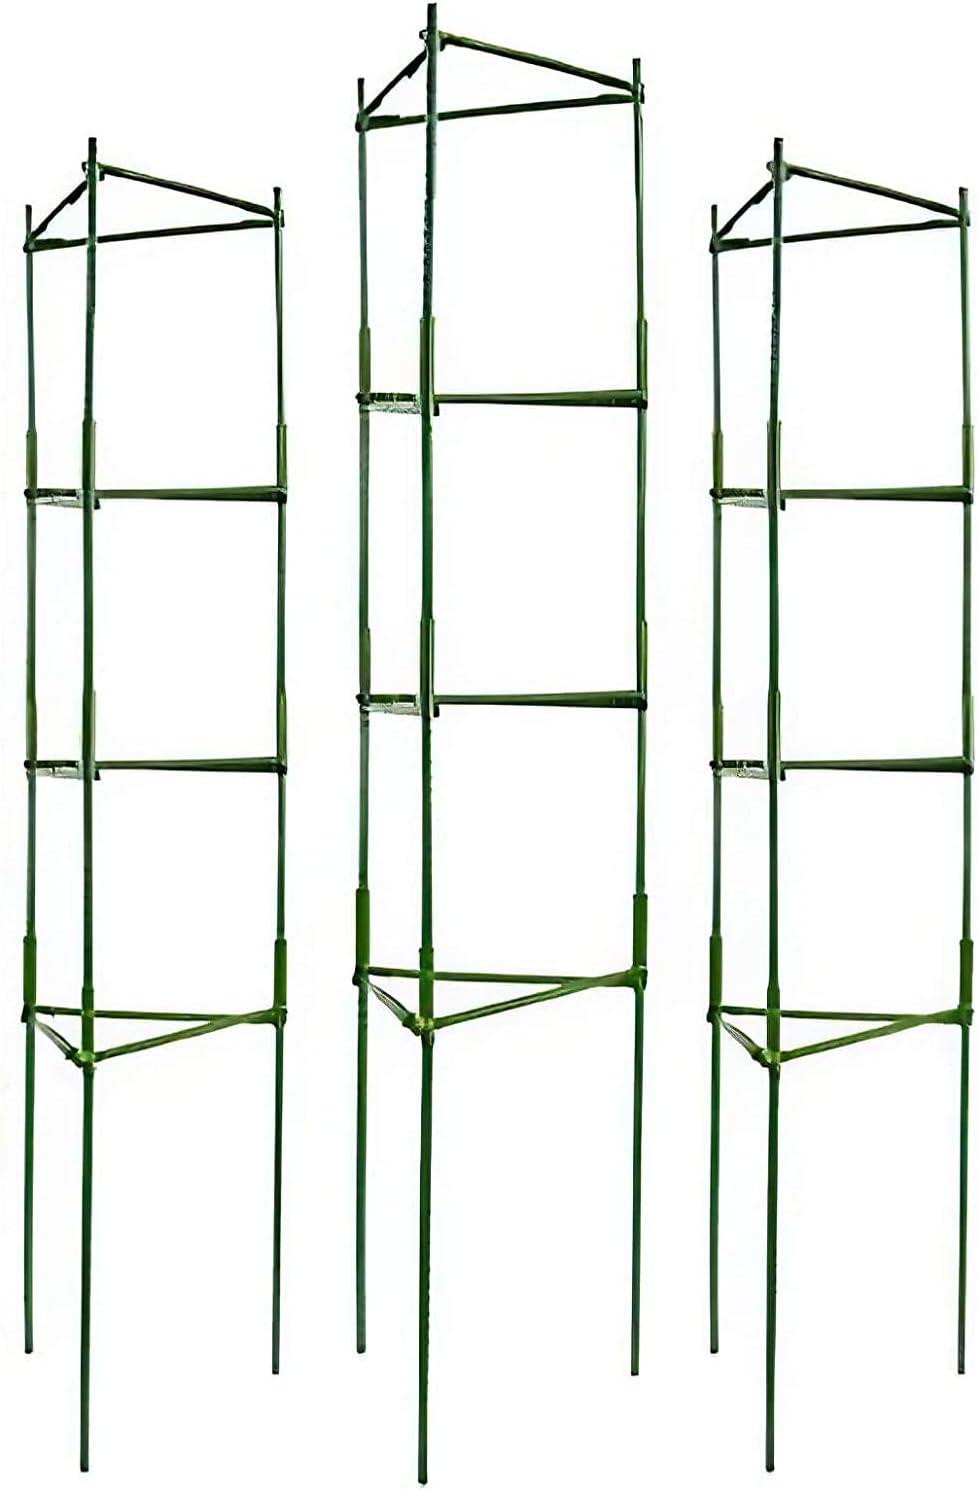 IPSXP Vegetable Trellis, Garden Plant Support Stakes for Climbing Plants, Vegetables, Flowers, Fruits, Vine, 4 Garden Trellis with 80 Adjustable Cable Tie